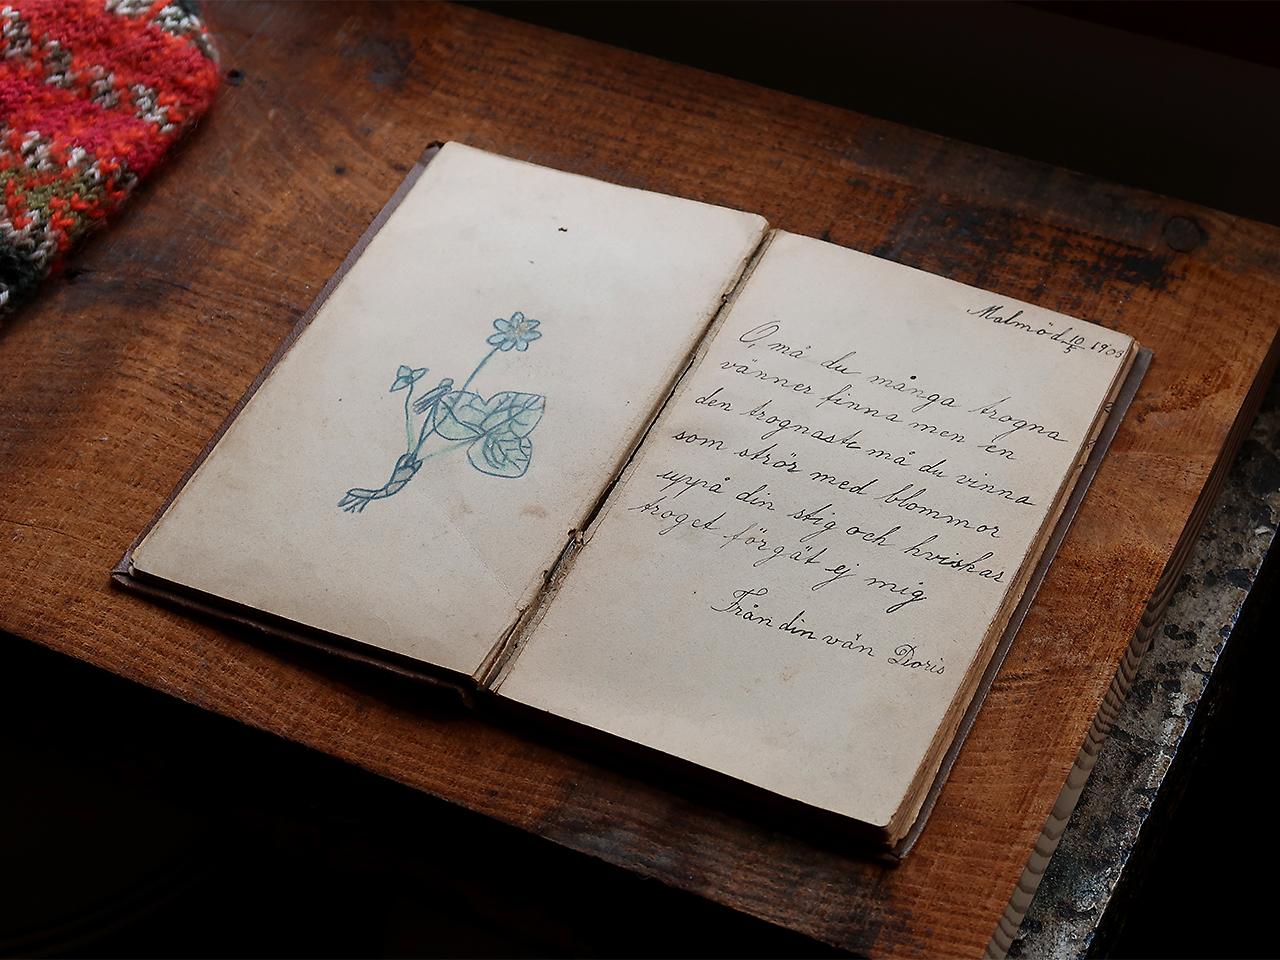 Soil 20世紀初頭の絵日記帳